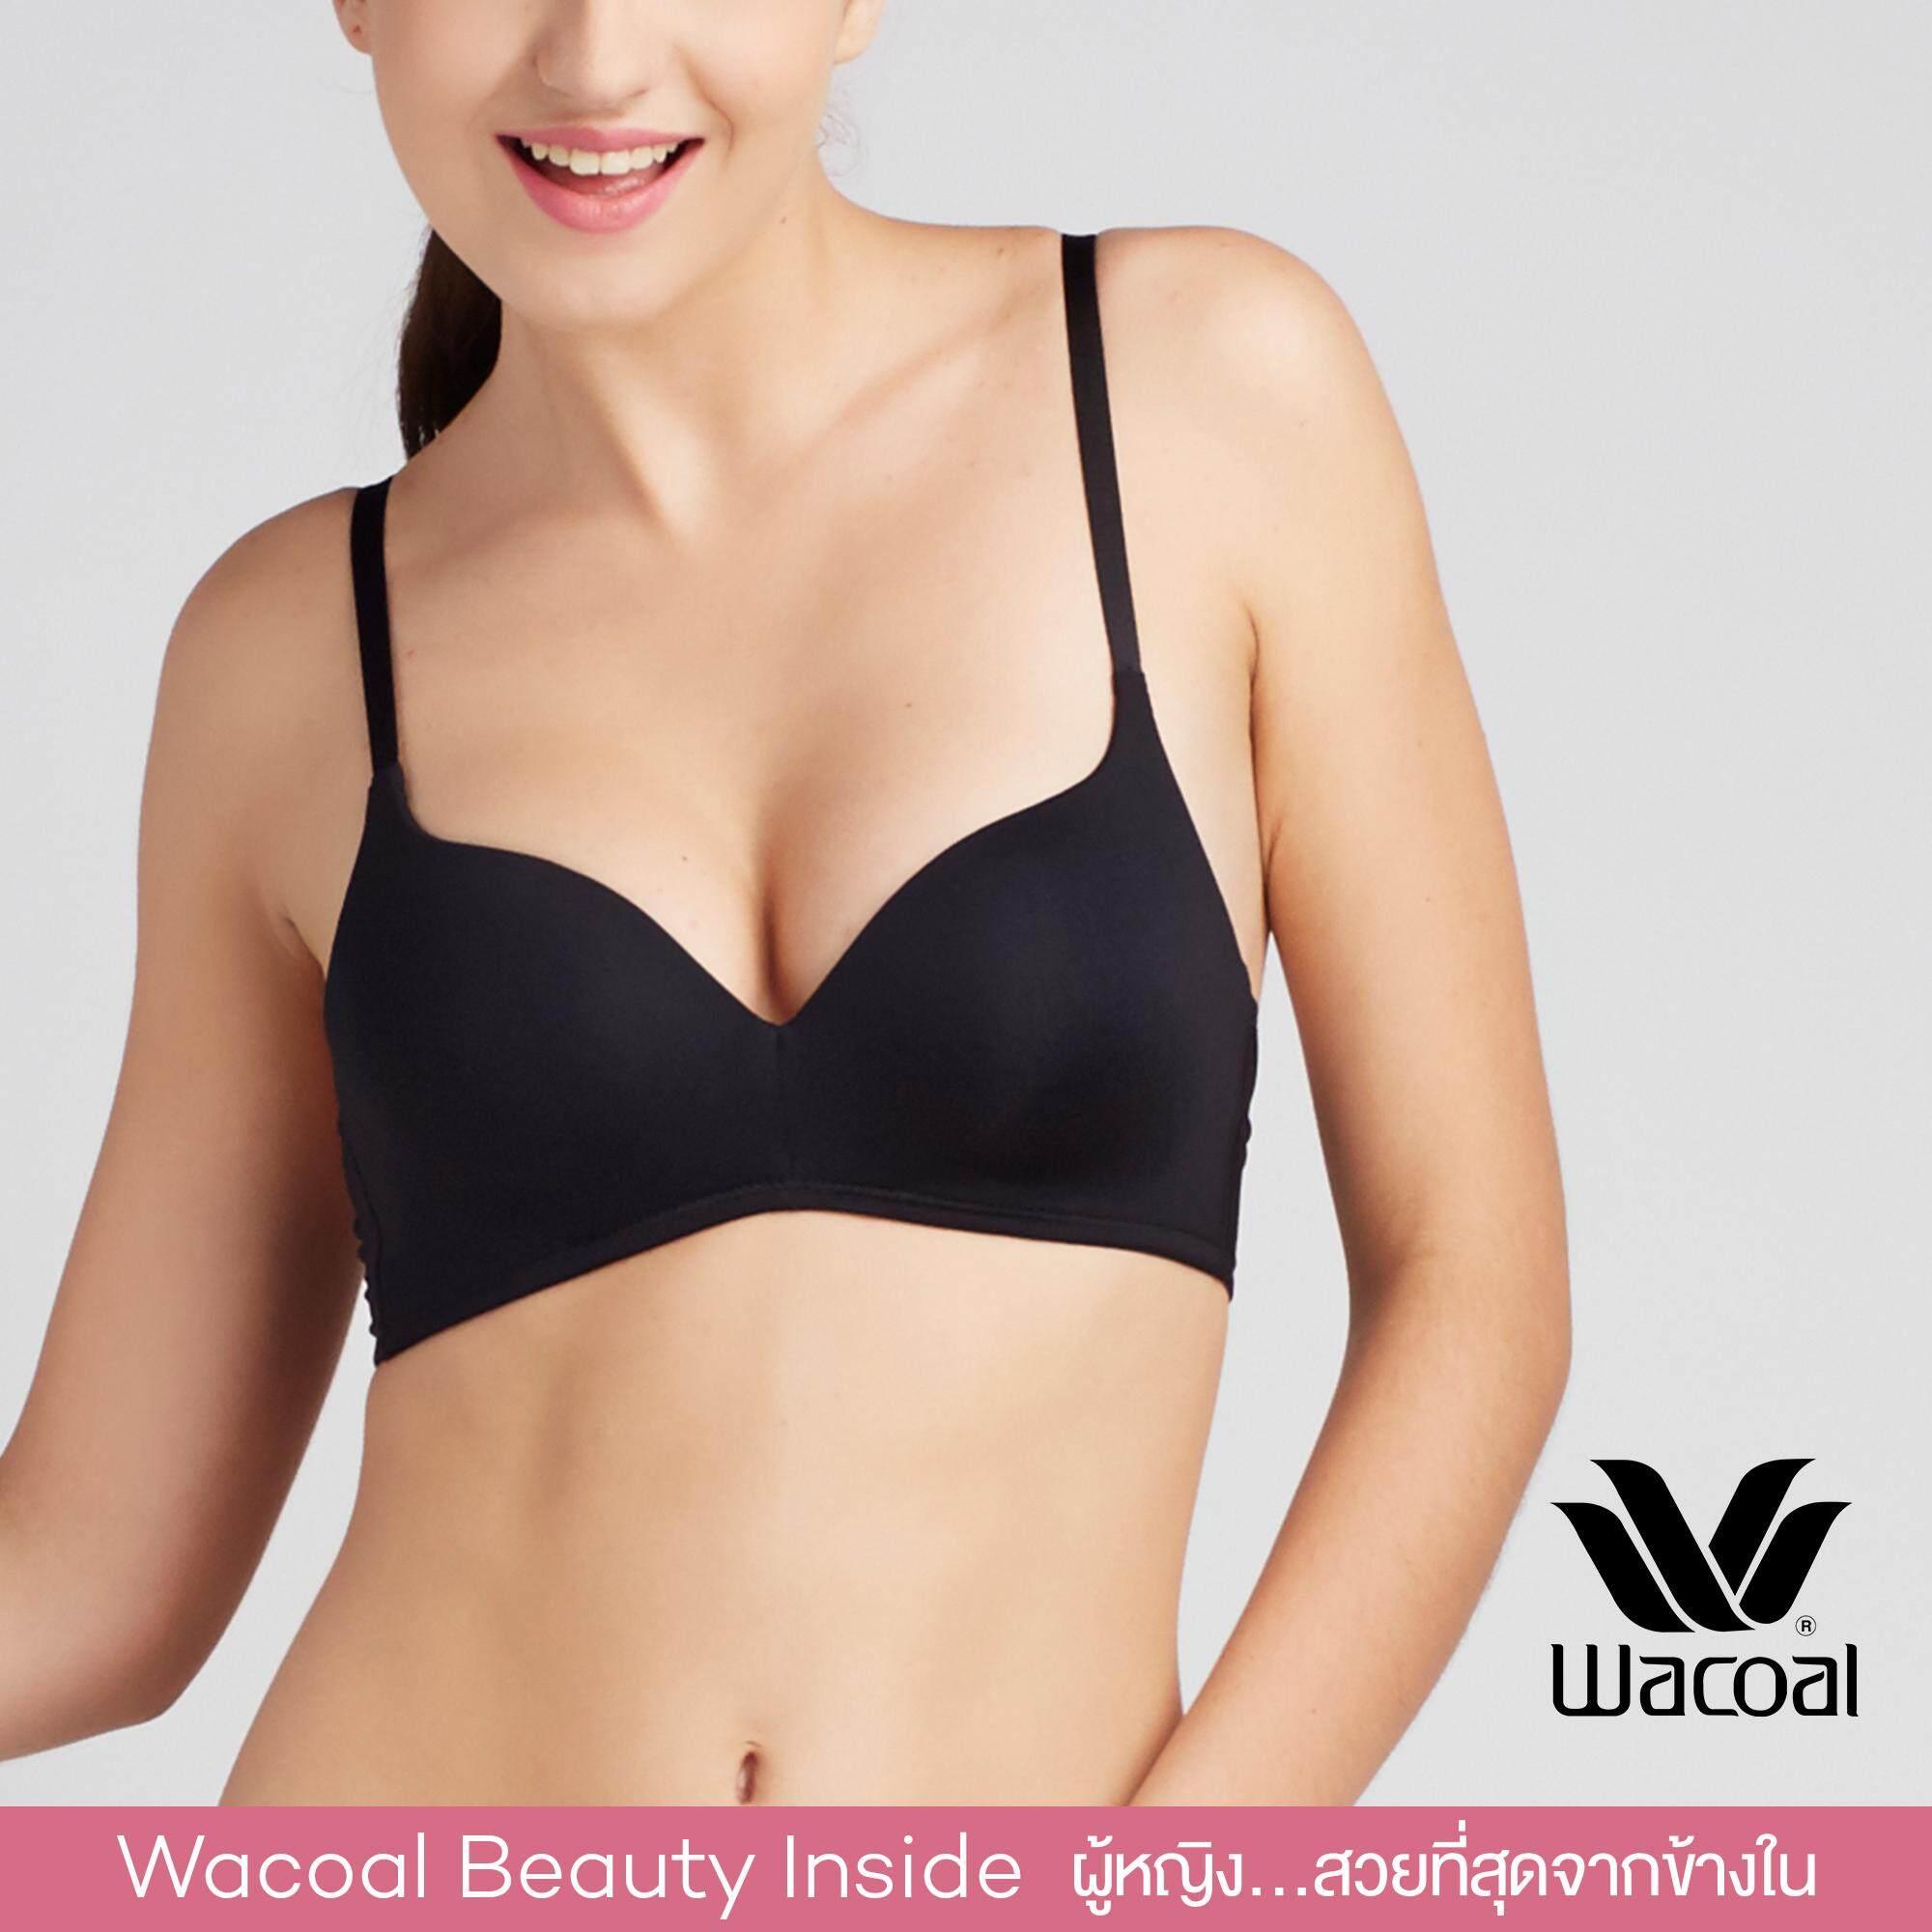 Wacoal Best Seller Wireless bra บราไร้โครง 3/4 Cup (สีดำ/BLACK) - WB5577BL